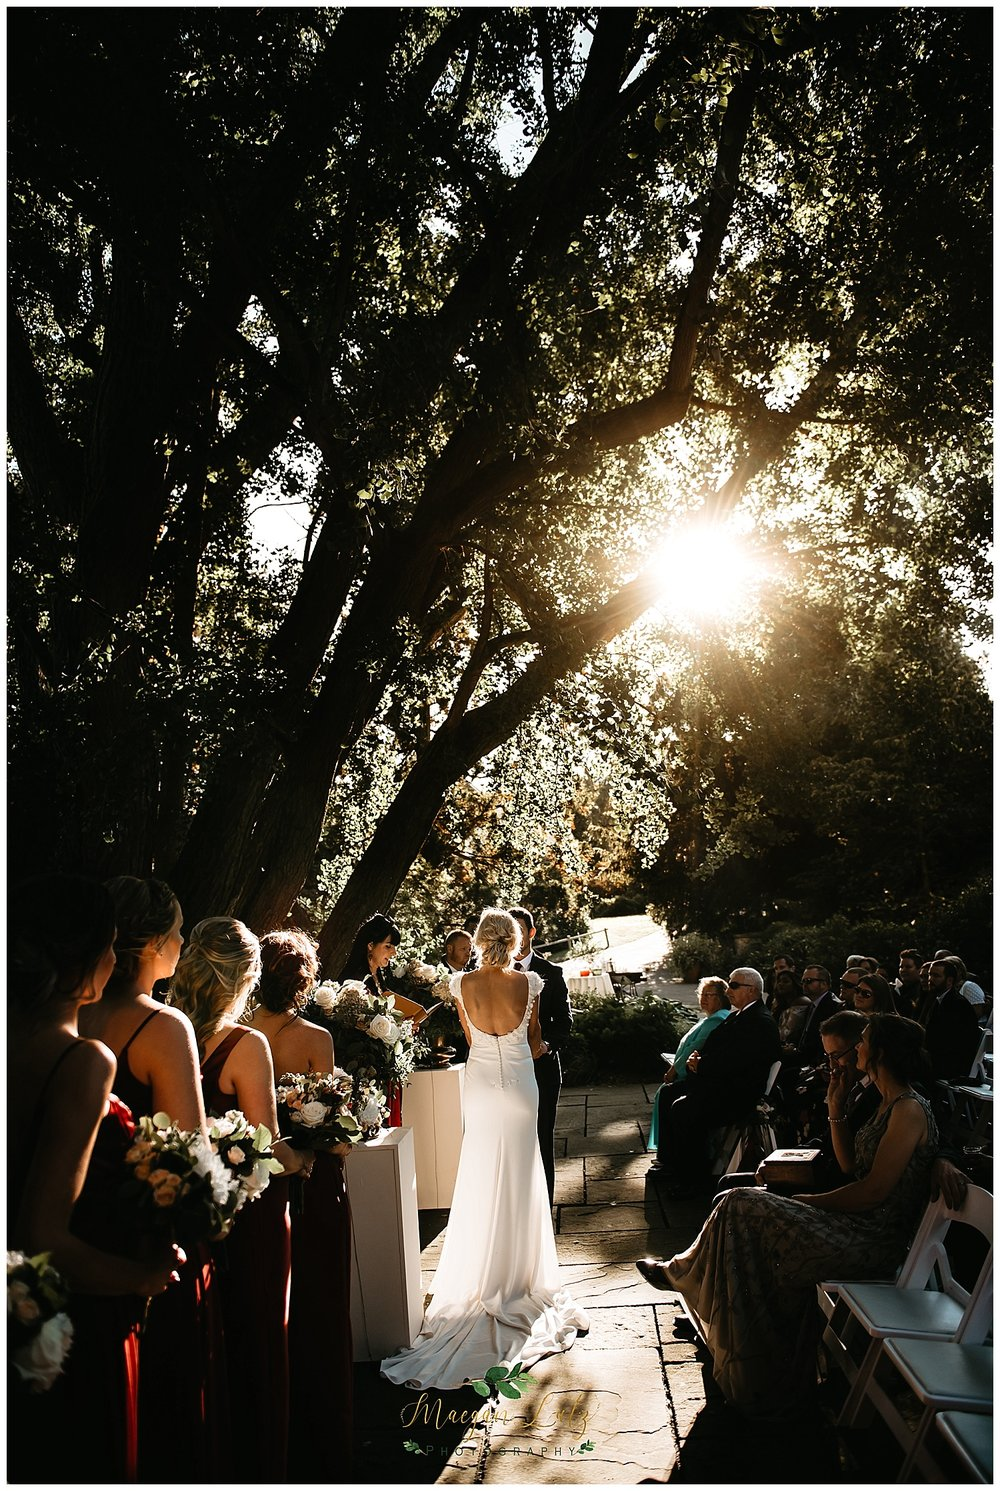 NEPA-wedding-photographer-at-Tyler-Arboretum-Media-PA_0023.jpg